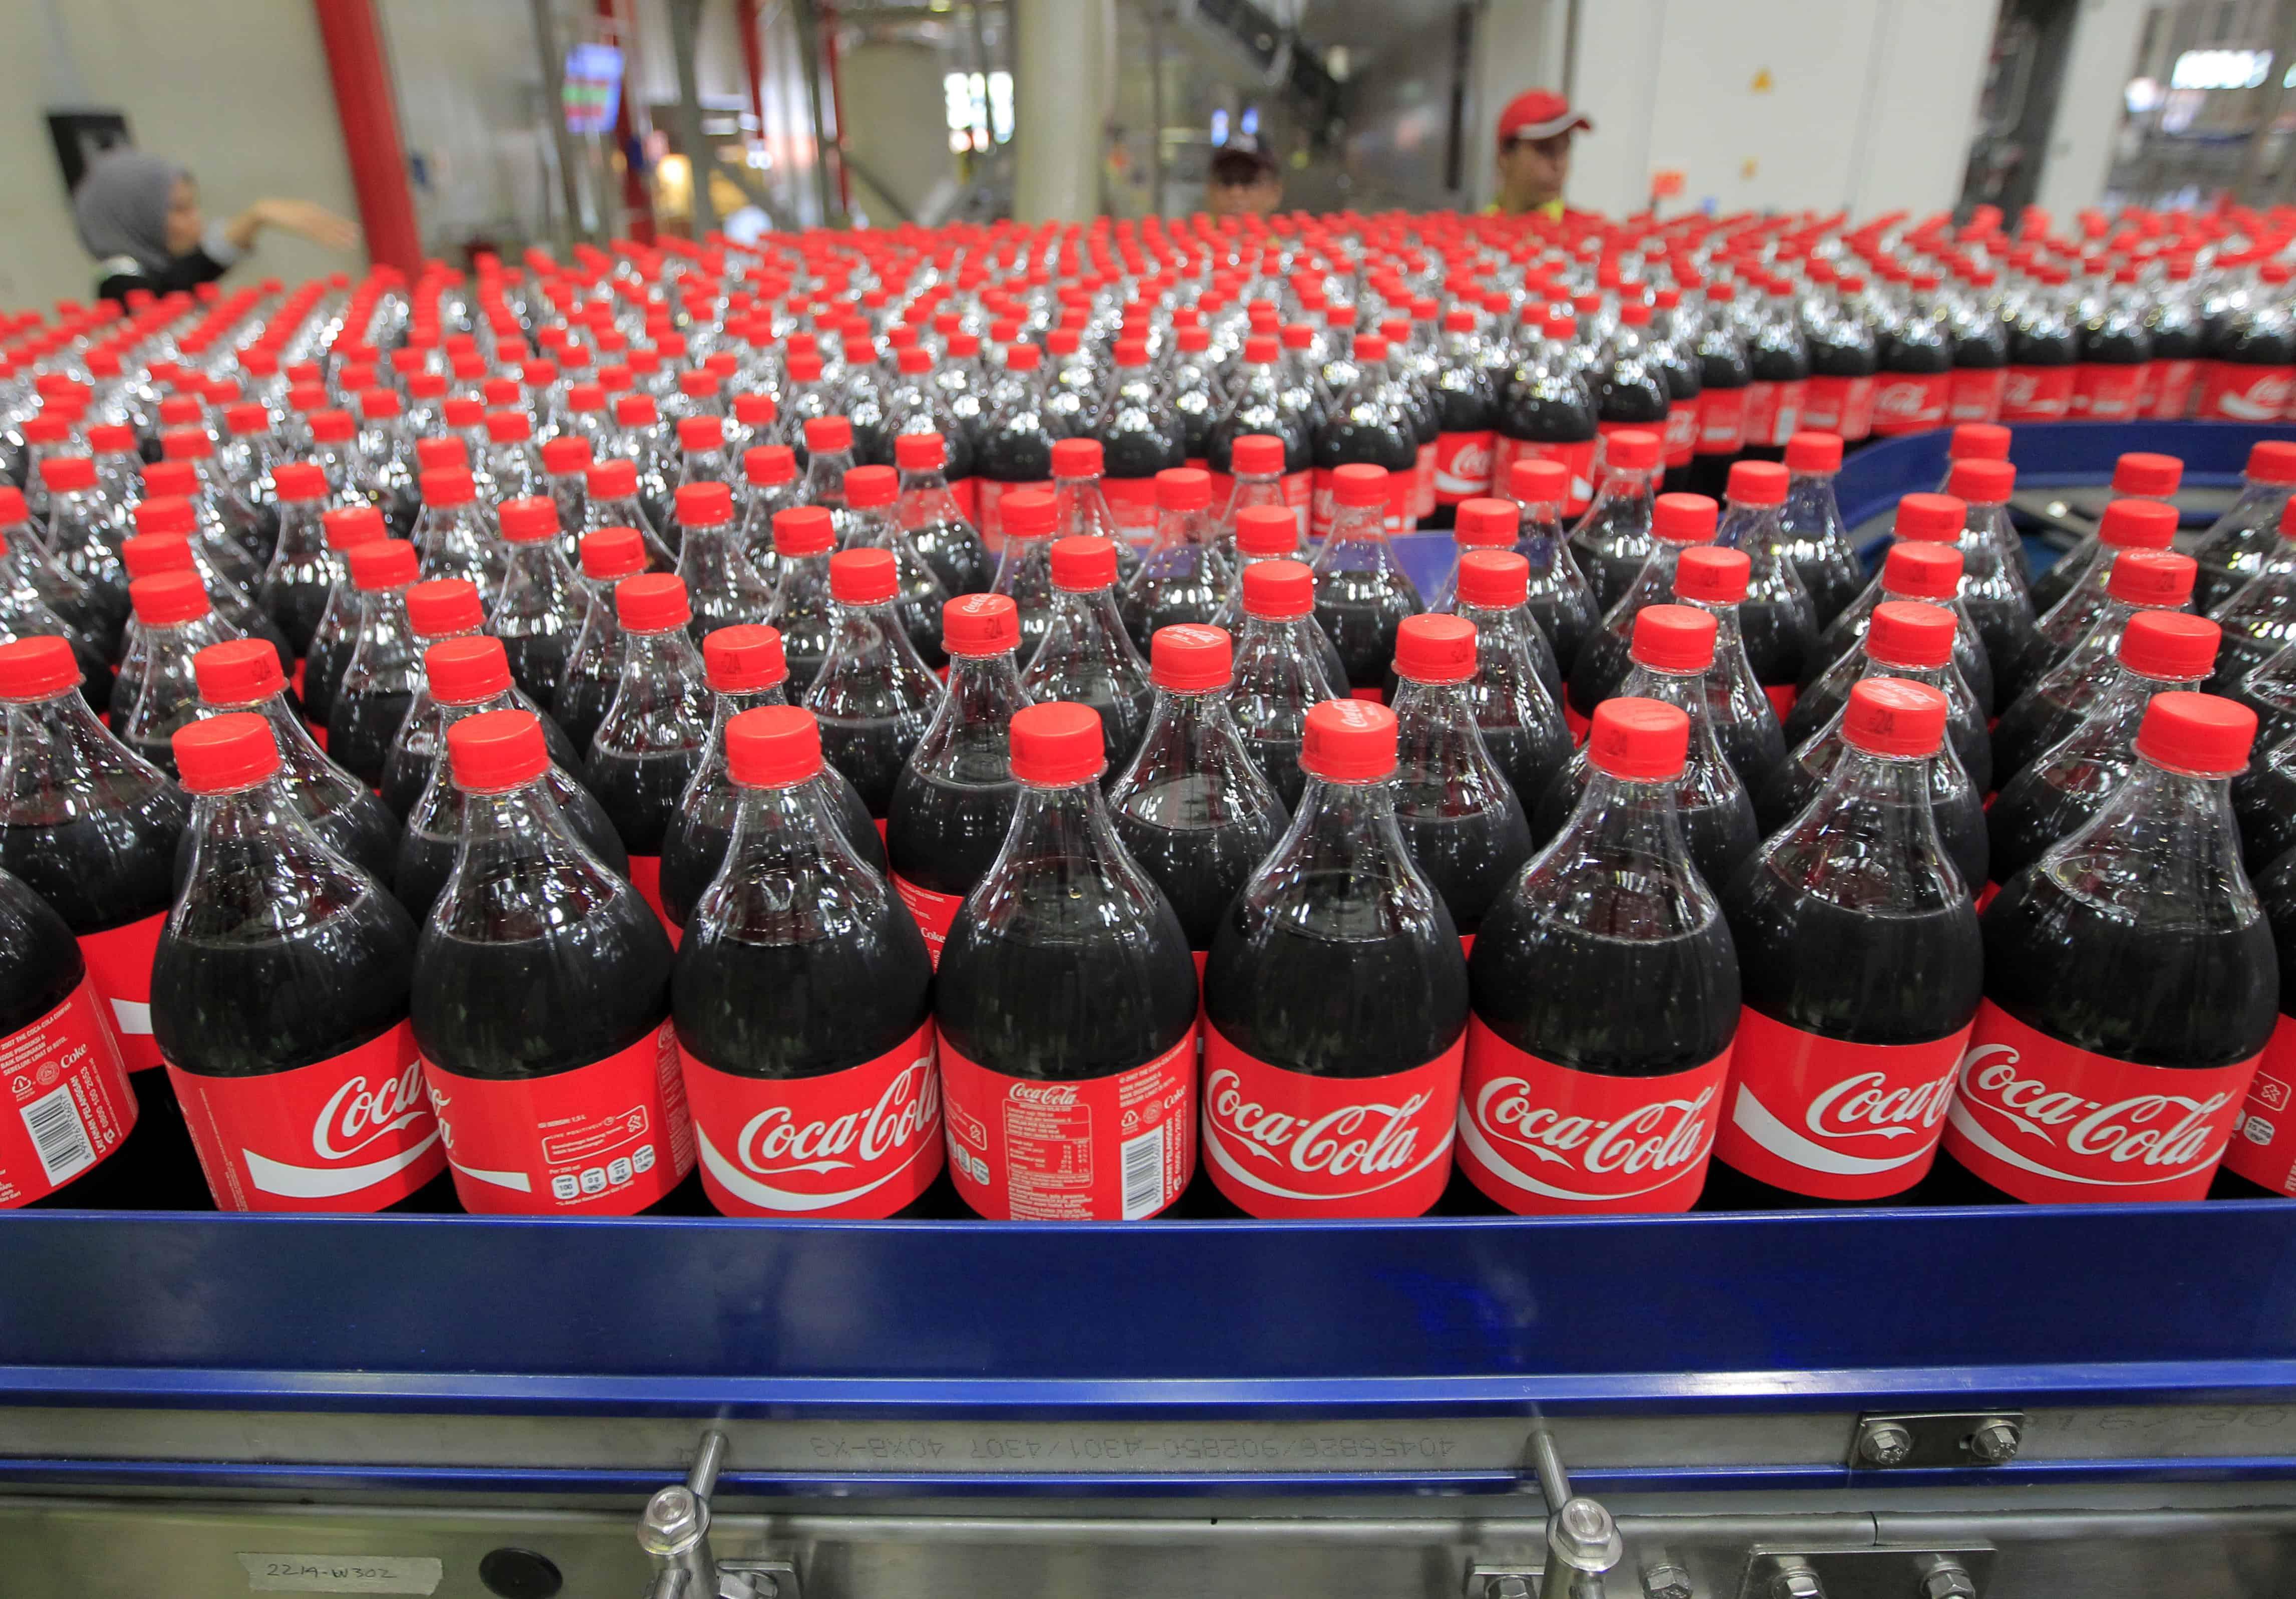 Un grand nombre de bouteilles de Coca-Cola sortent de la ceinture.